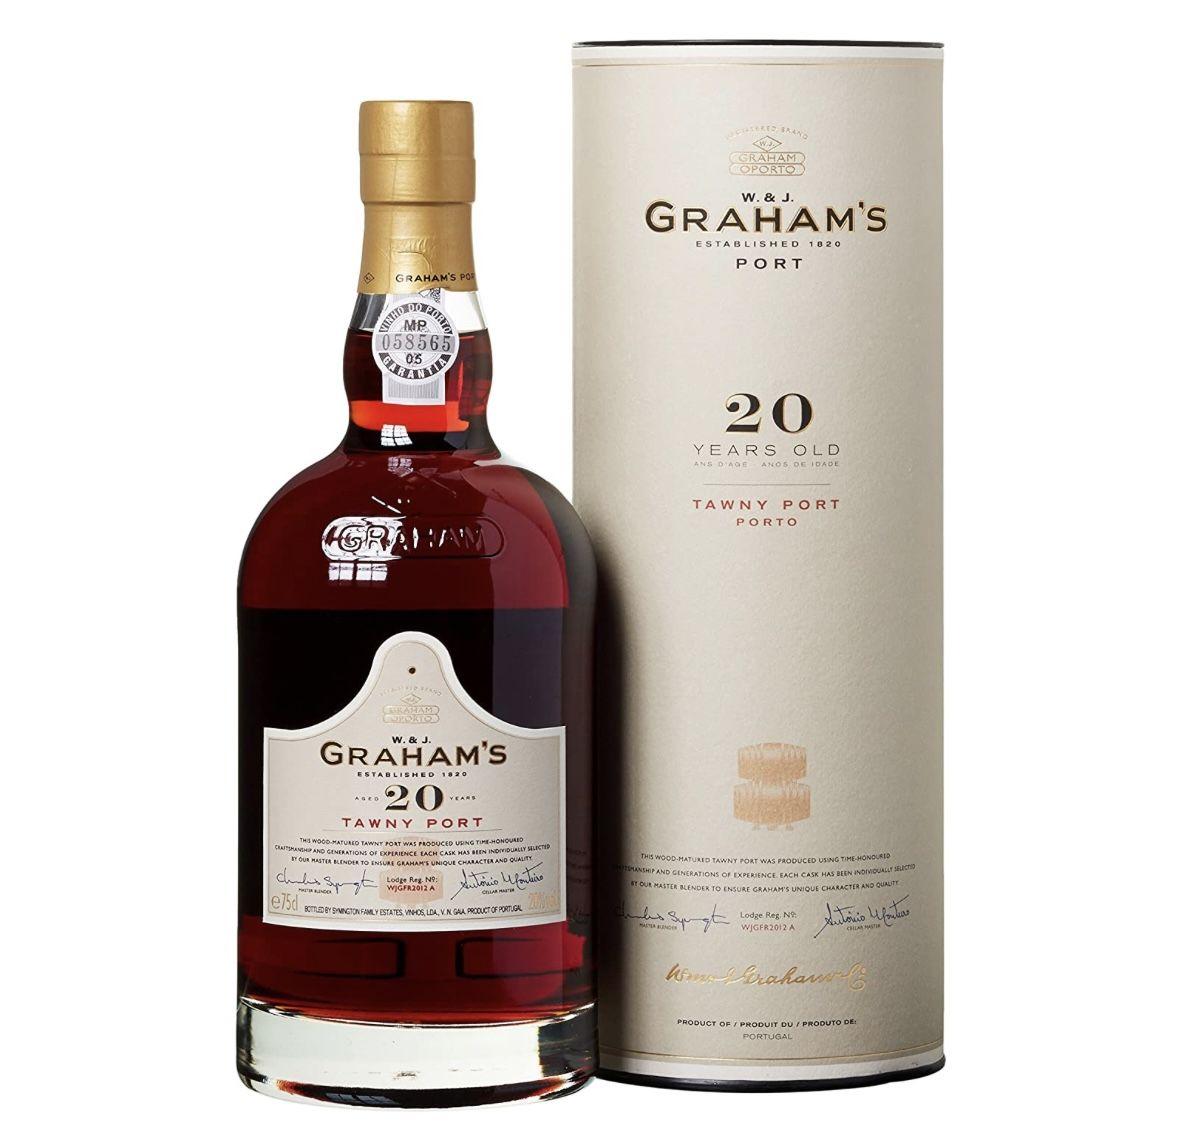 3 x 0,75l Graham's Tawny Port 20 Years Portwein für 100€ (statt 117€)